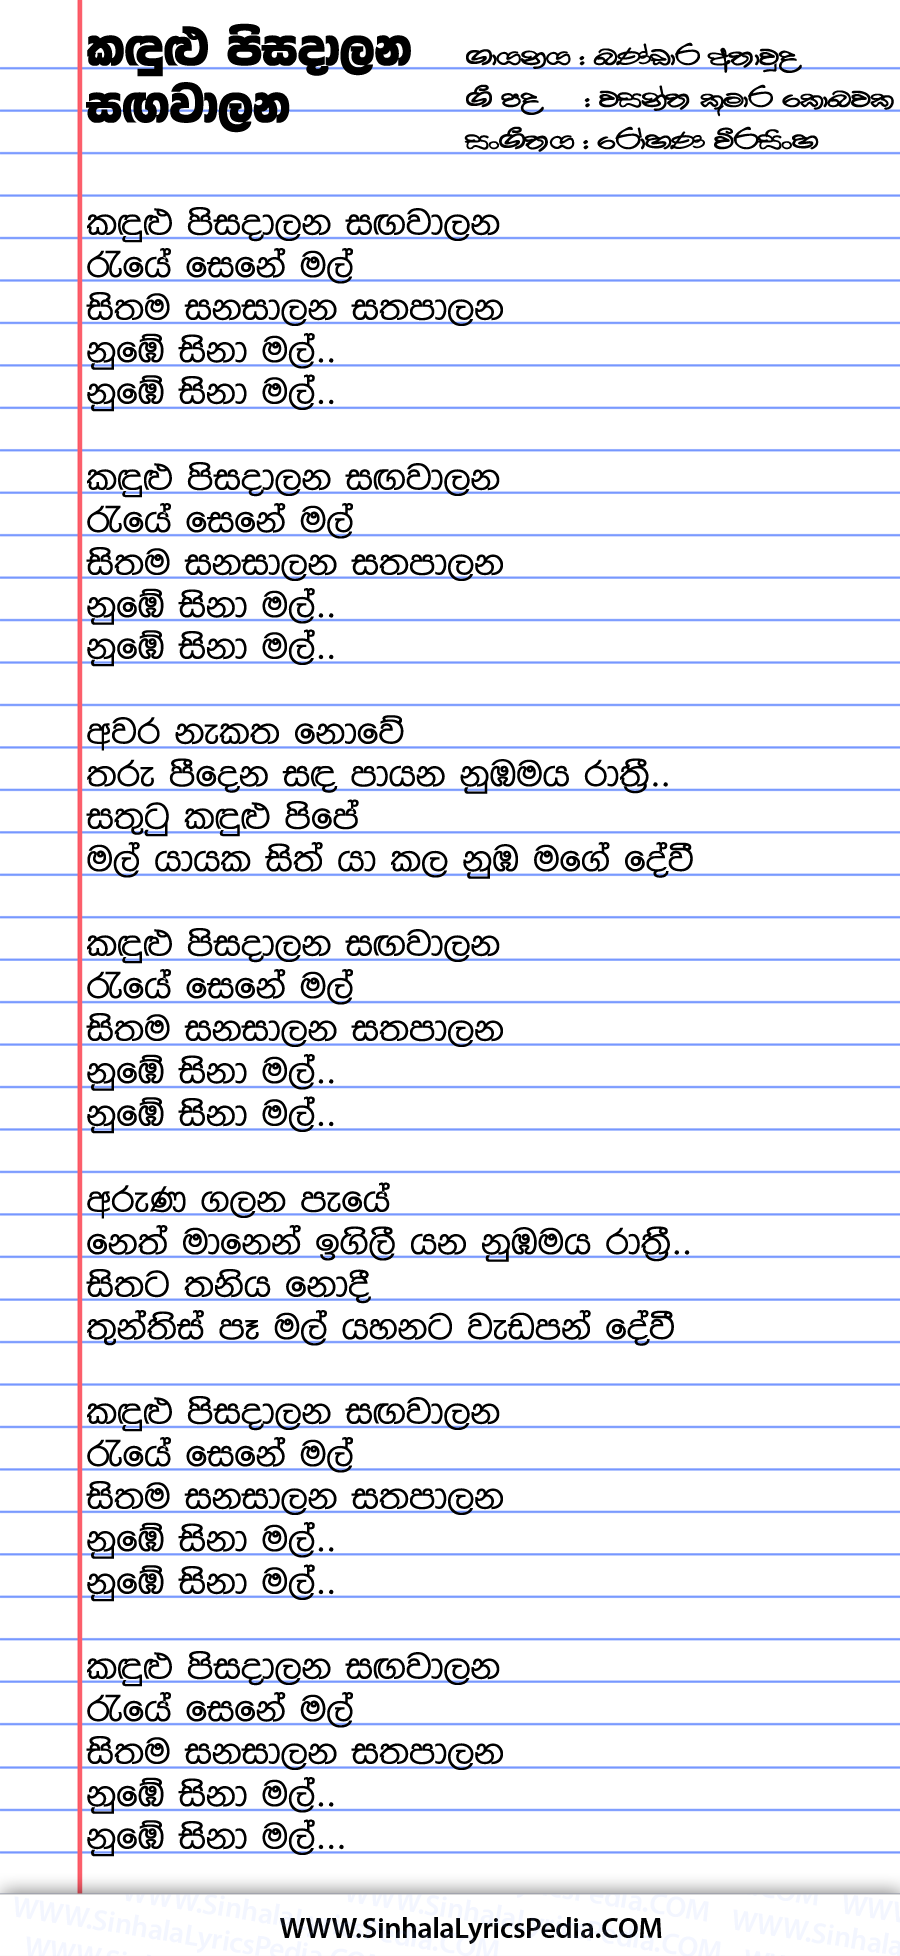 Kandulu Pisadalana Sangawalana Song Lyrics